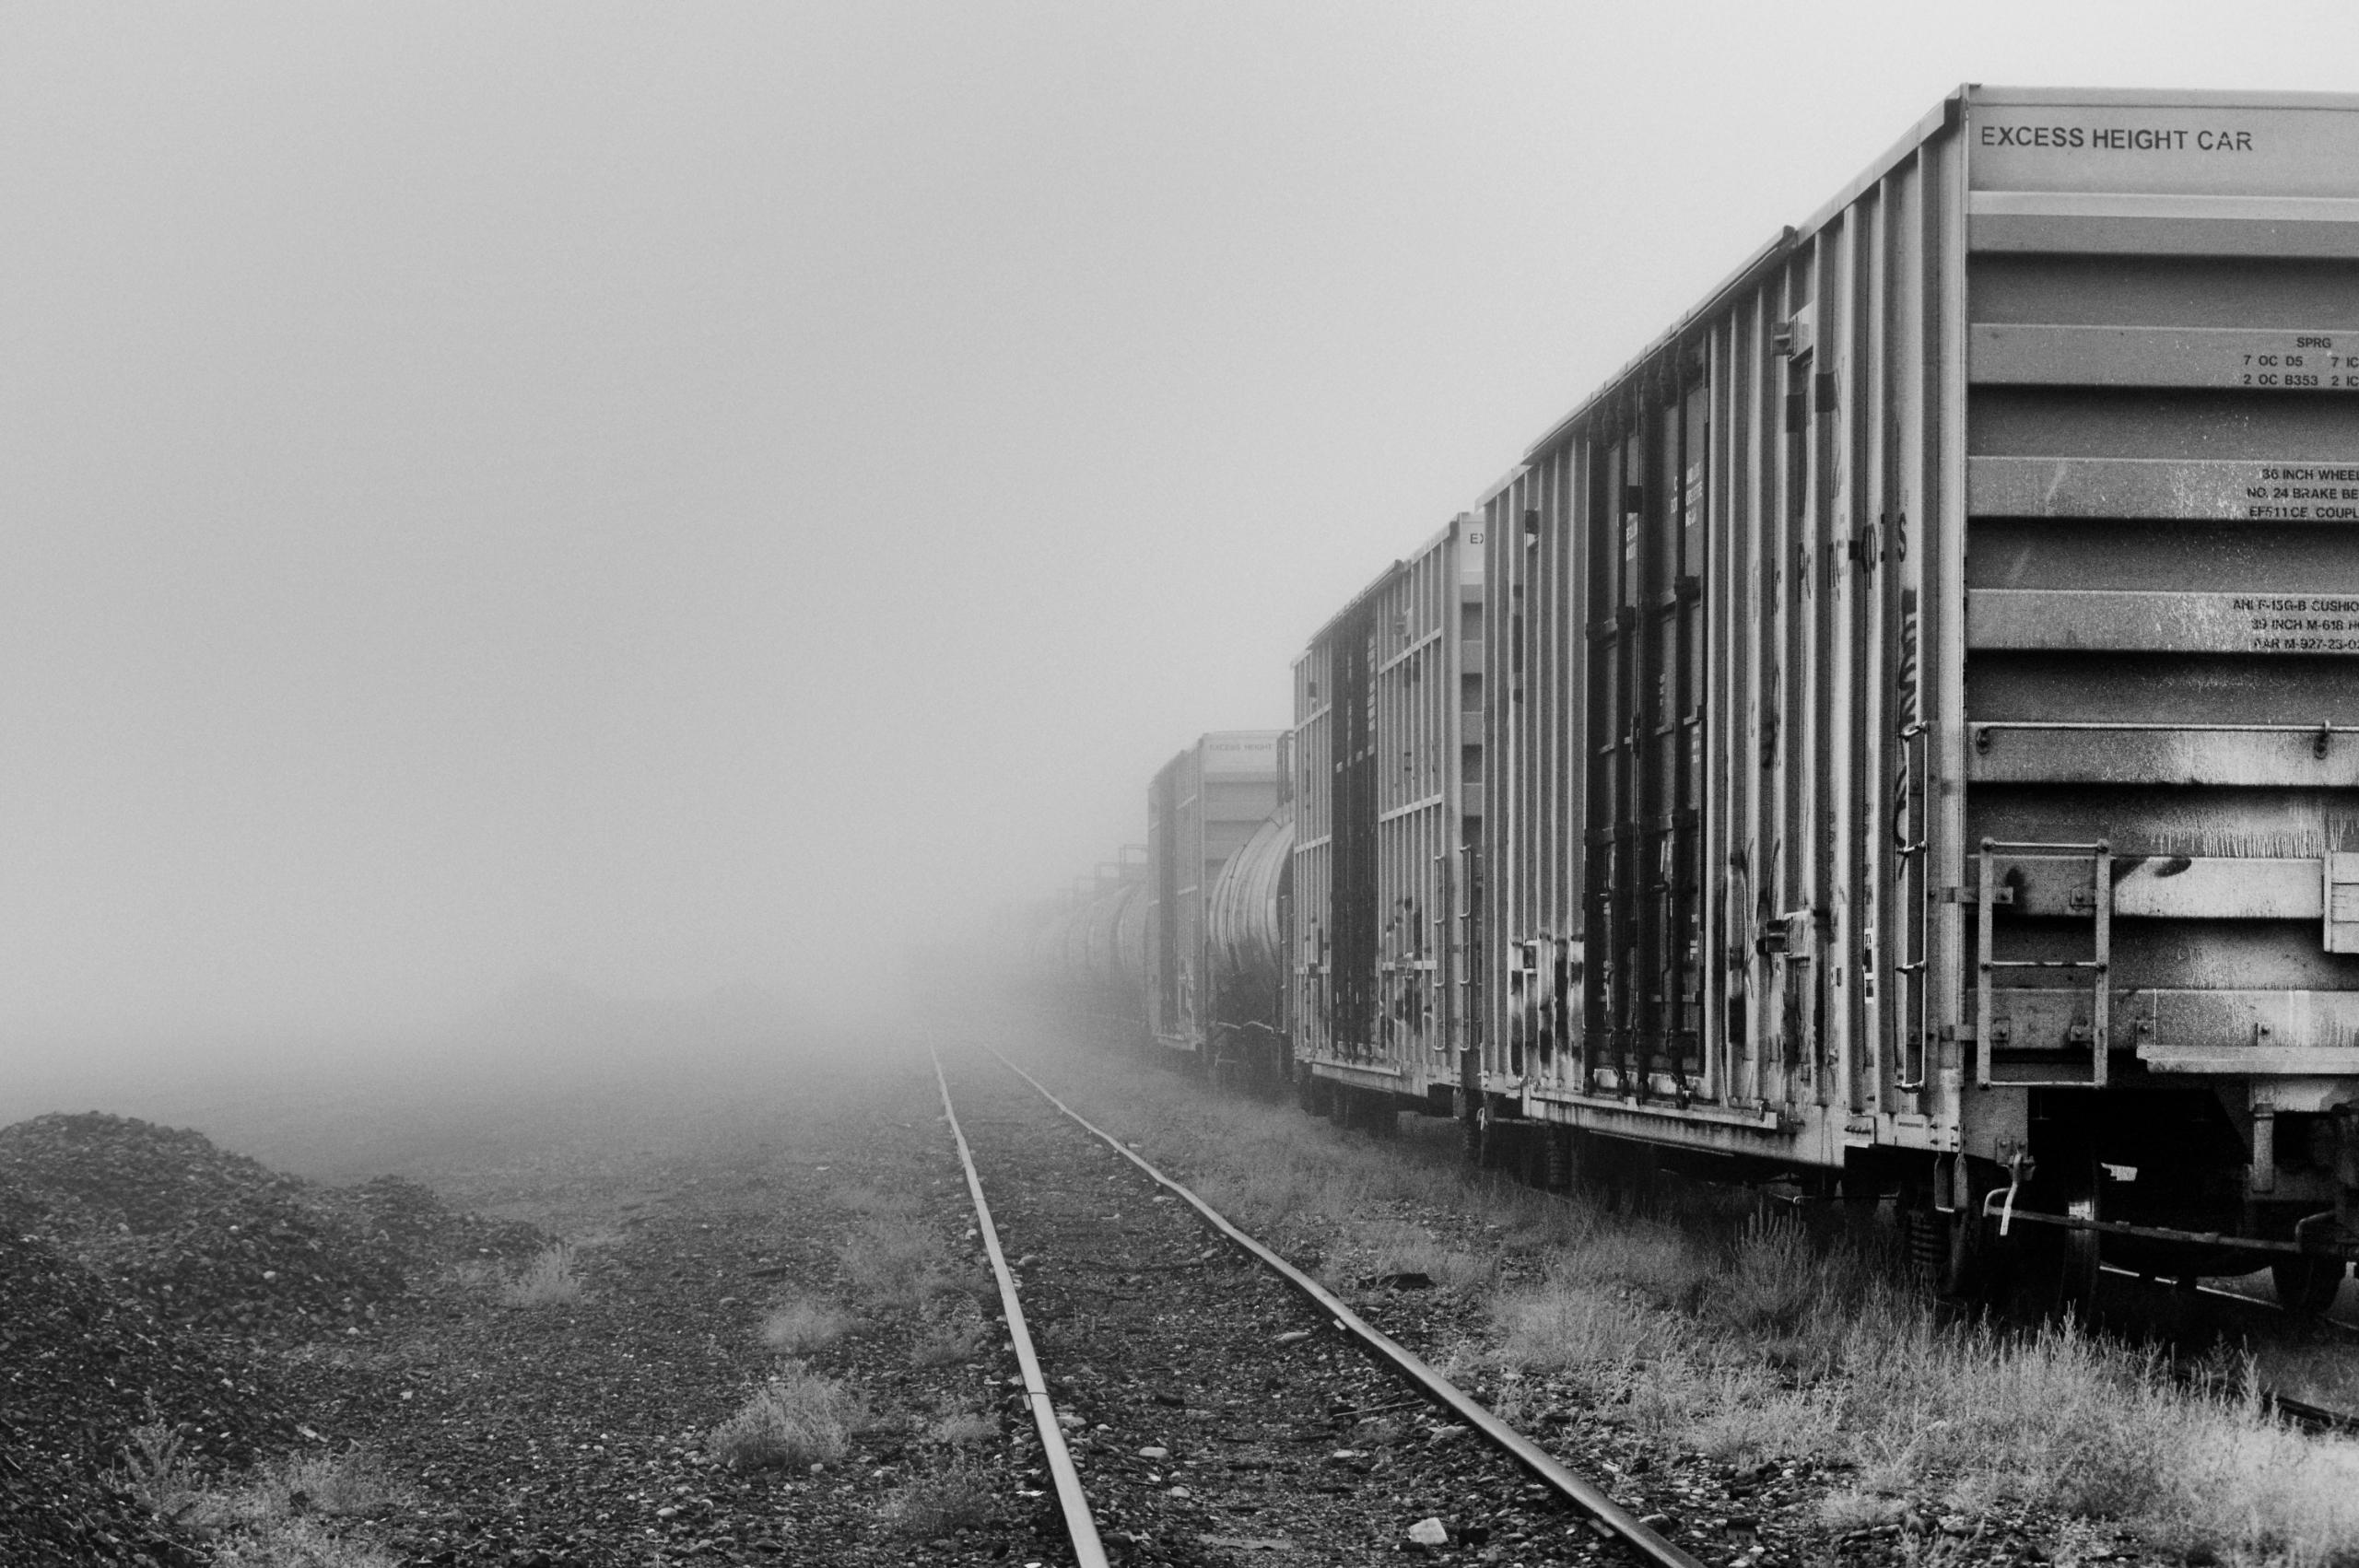 Railyard - bnw, bw, blackandwhitephotography - jeff_day | ello